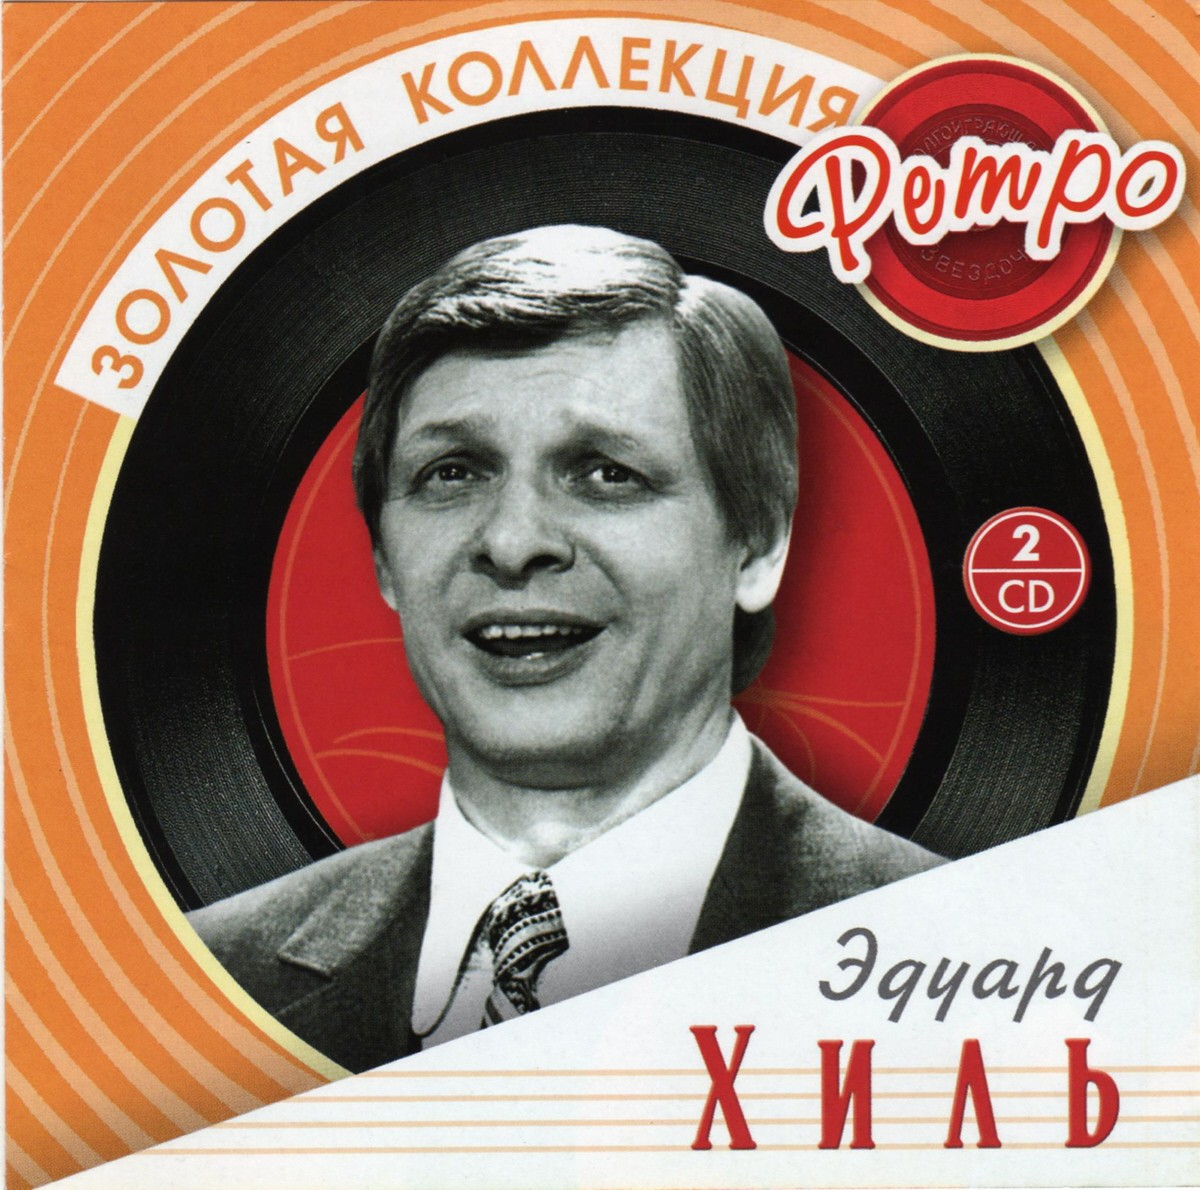 https://02varvara.files.wordpress.com/2012/06/00-eduard-khil-04-06-12.jpg?w=1200&h=1190